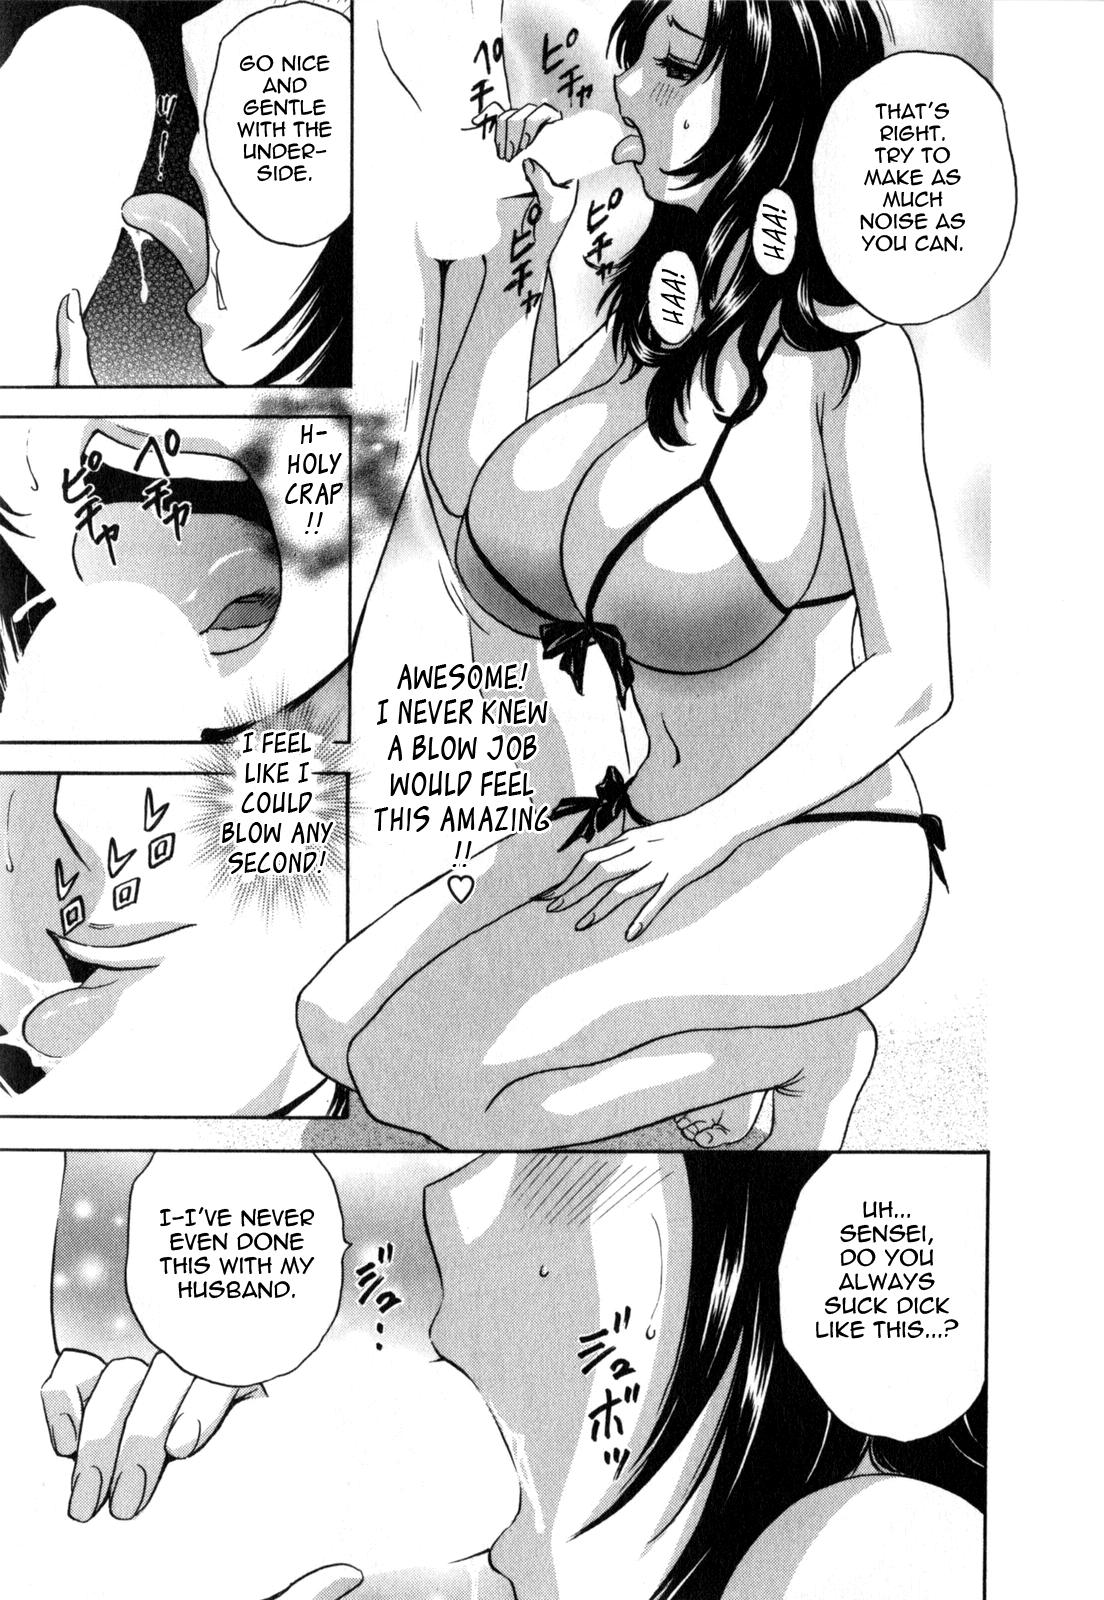 [Hidemaru] Life with Married Women Just Like a Manga 1 - Ch. 1-3 [English] {Tadanohito} 17